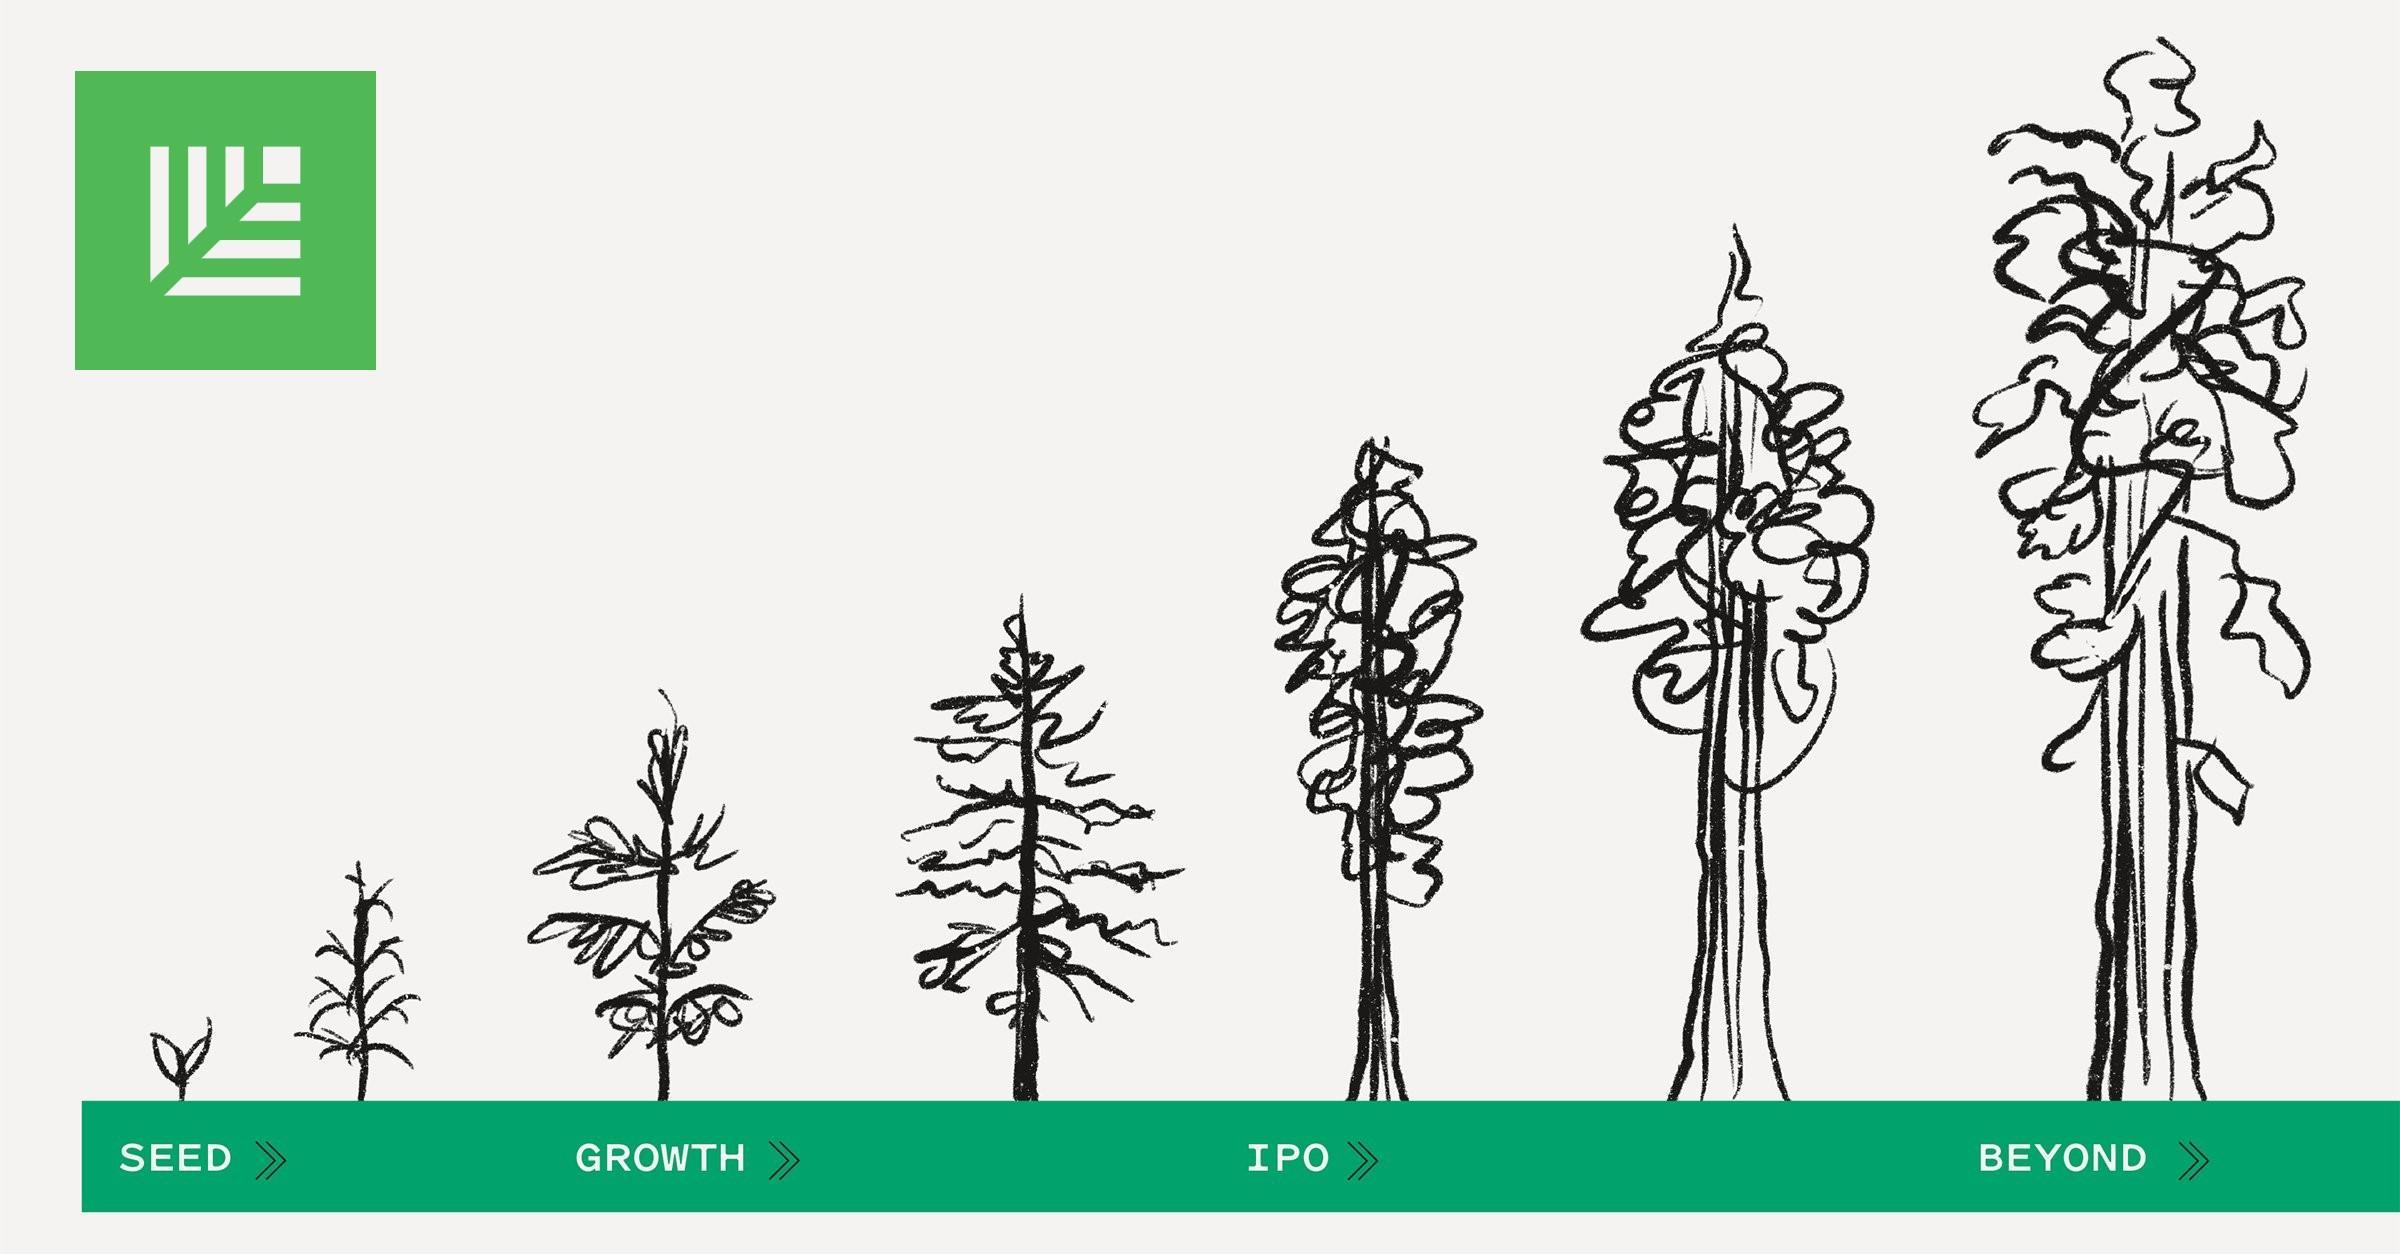 Illustration of sequoia tree growth